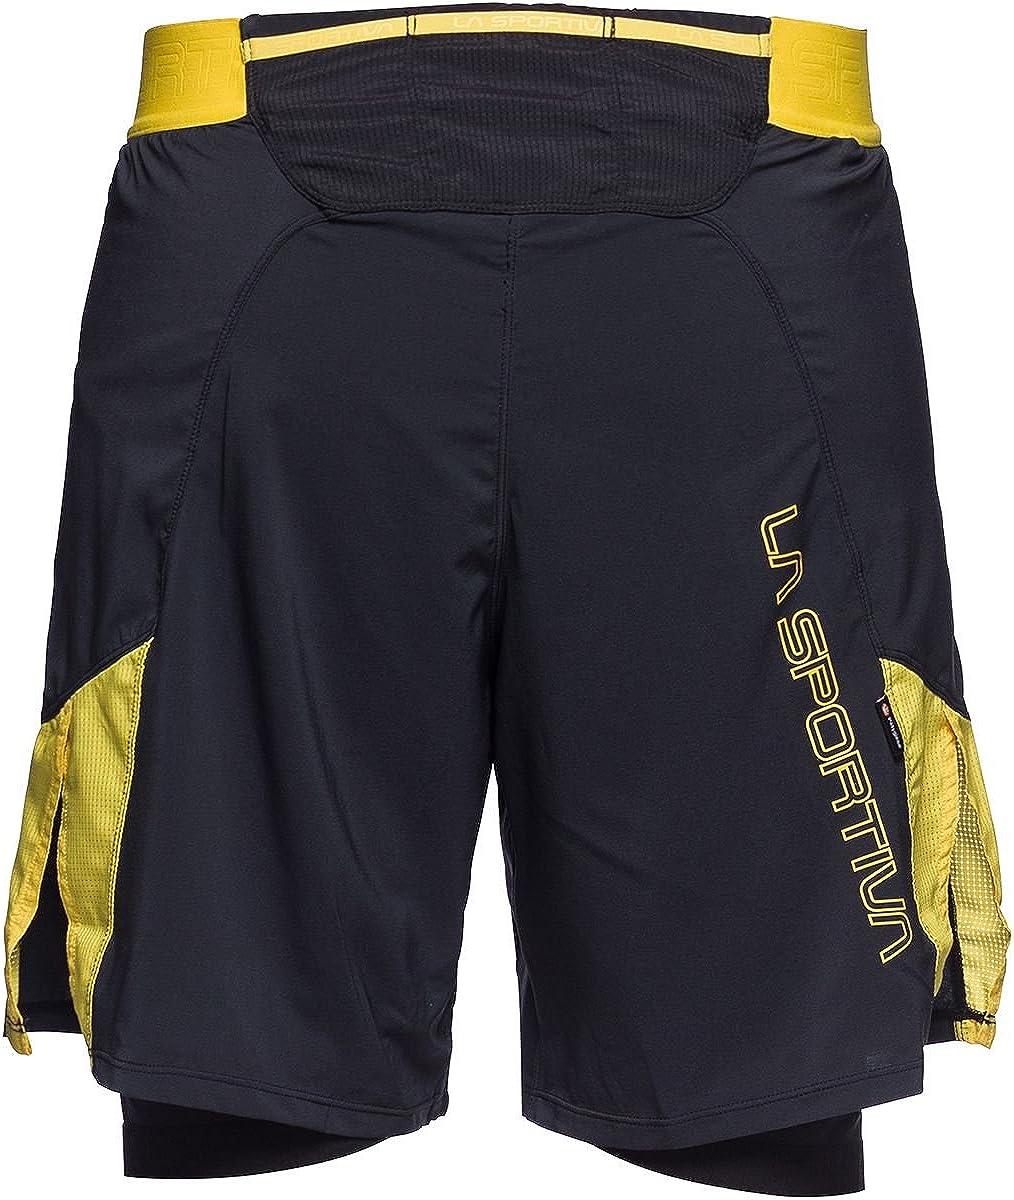 La Sportiva Velox M Pantal/ón Corto Hombre